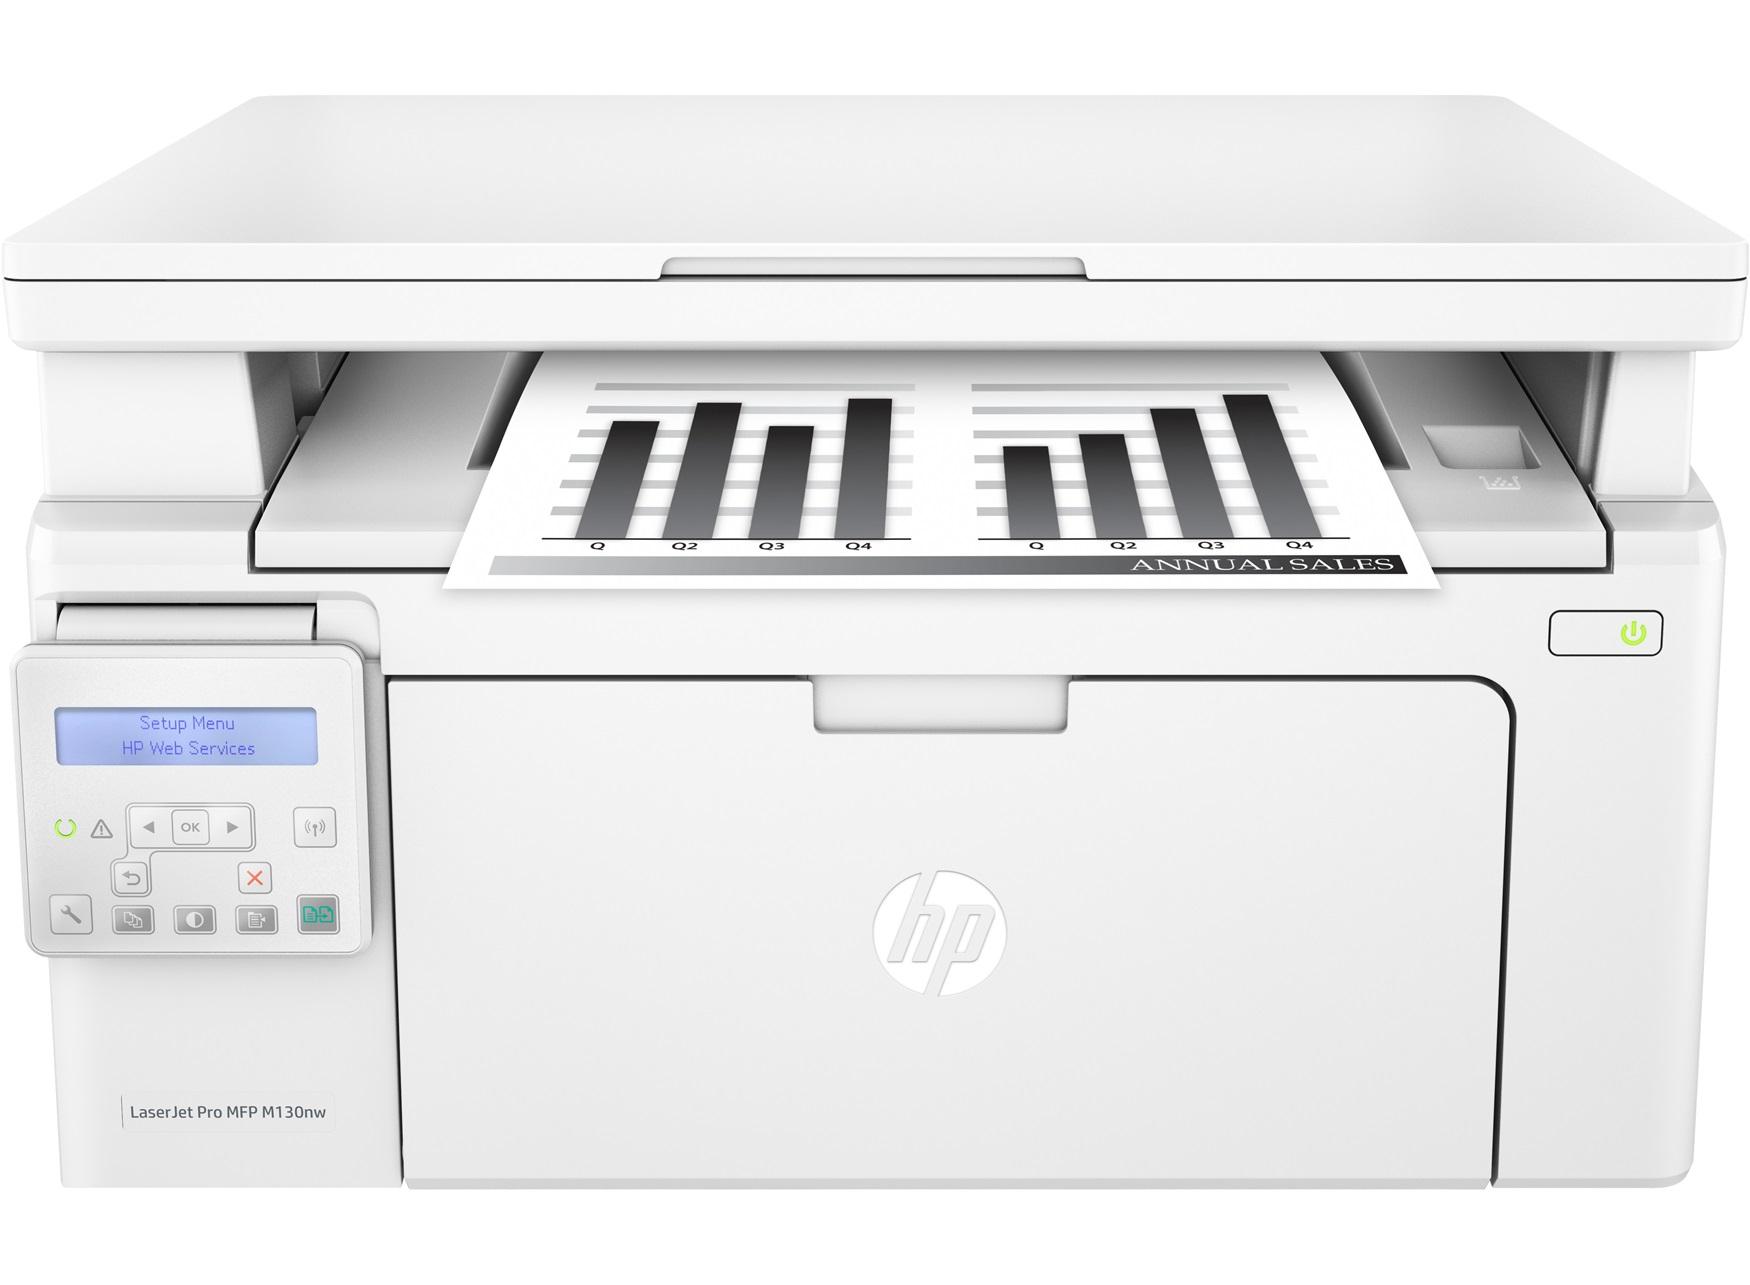 Принтер HP Laserjet Pro MFP M130NW VNFNC09364 - 3